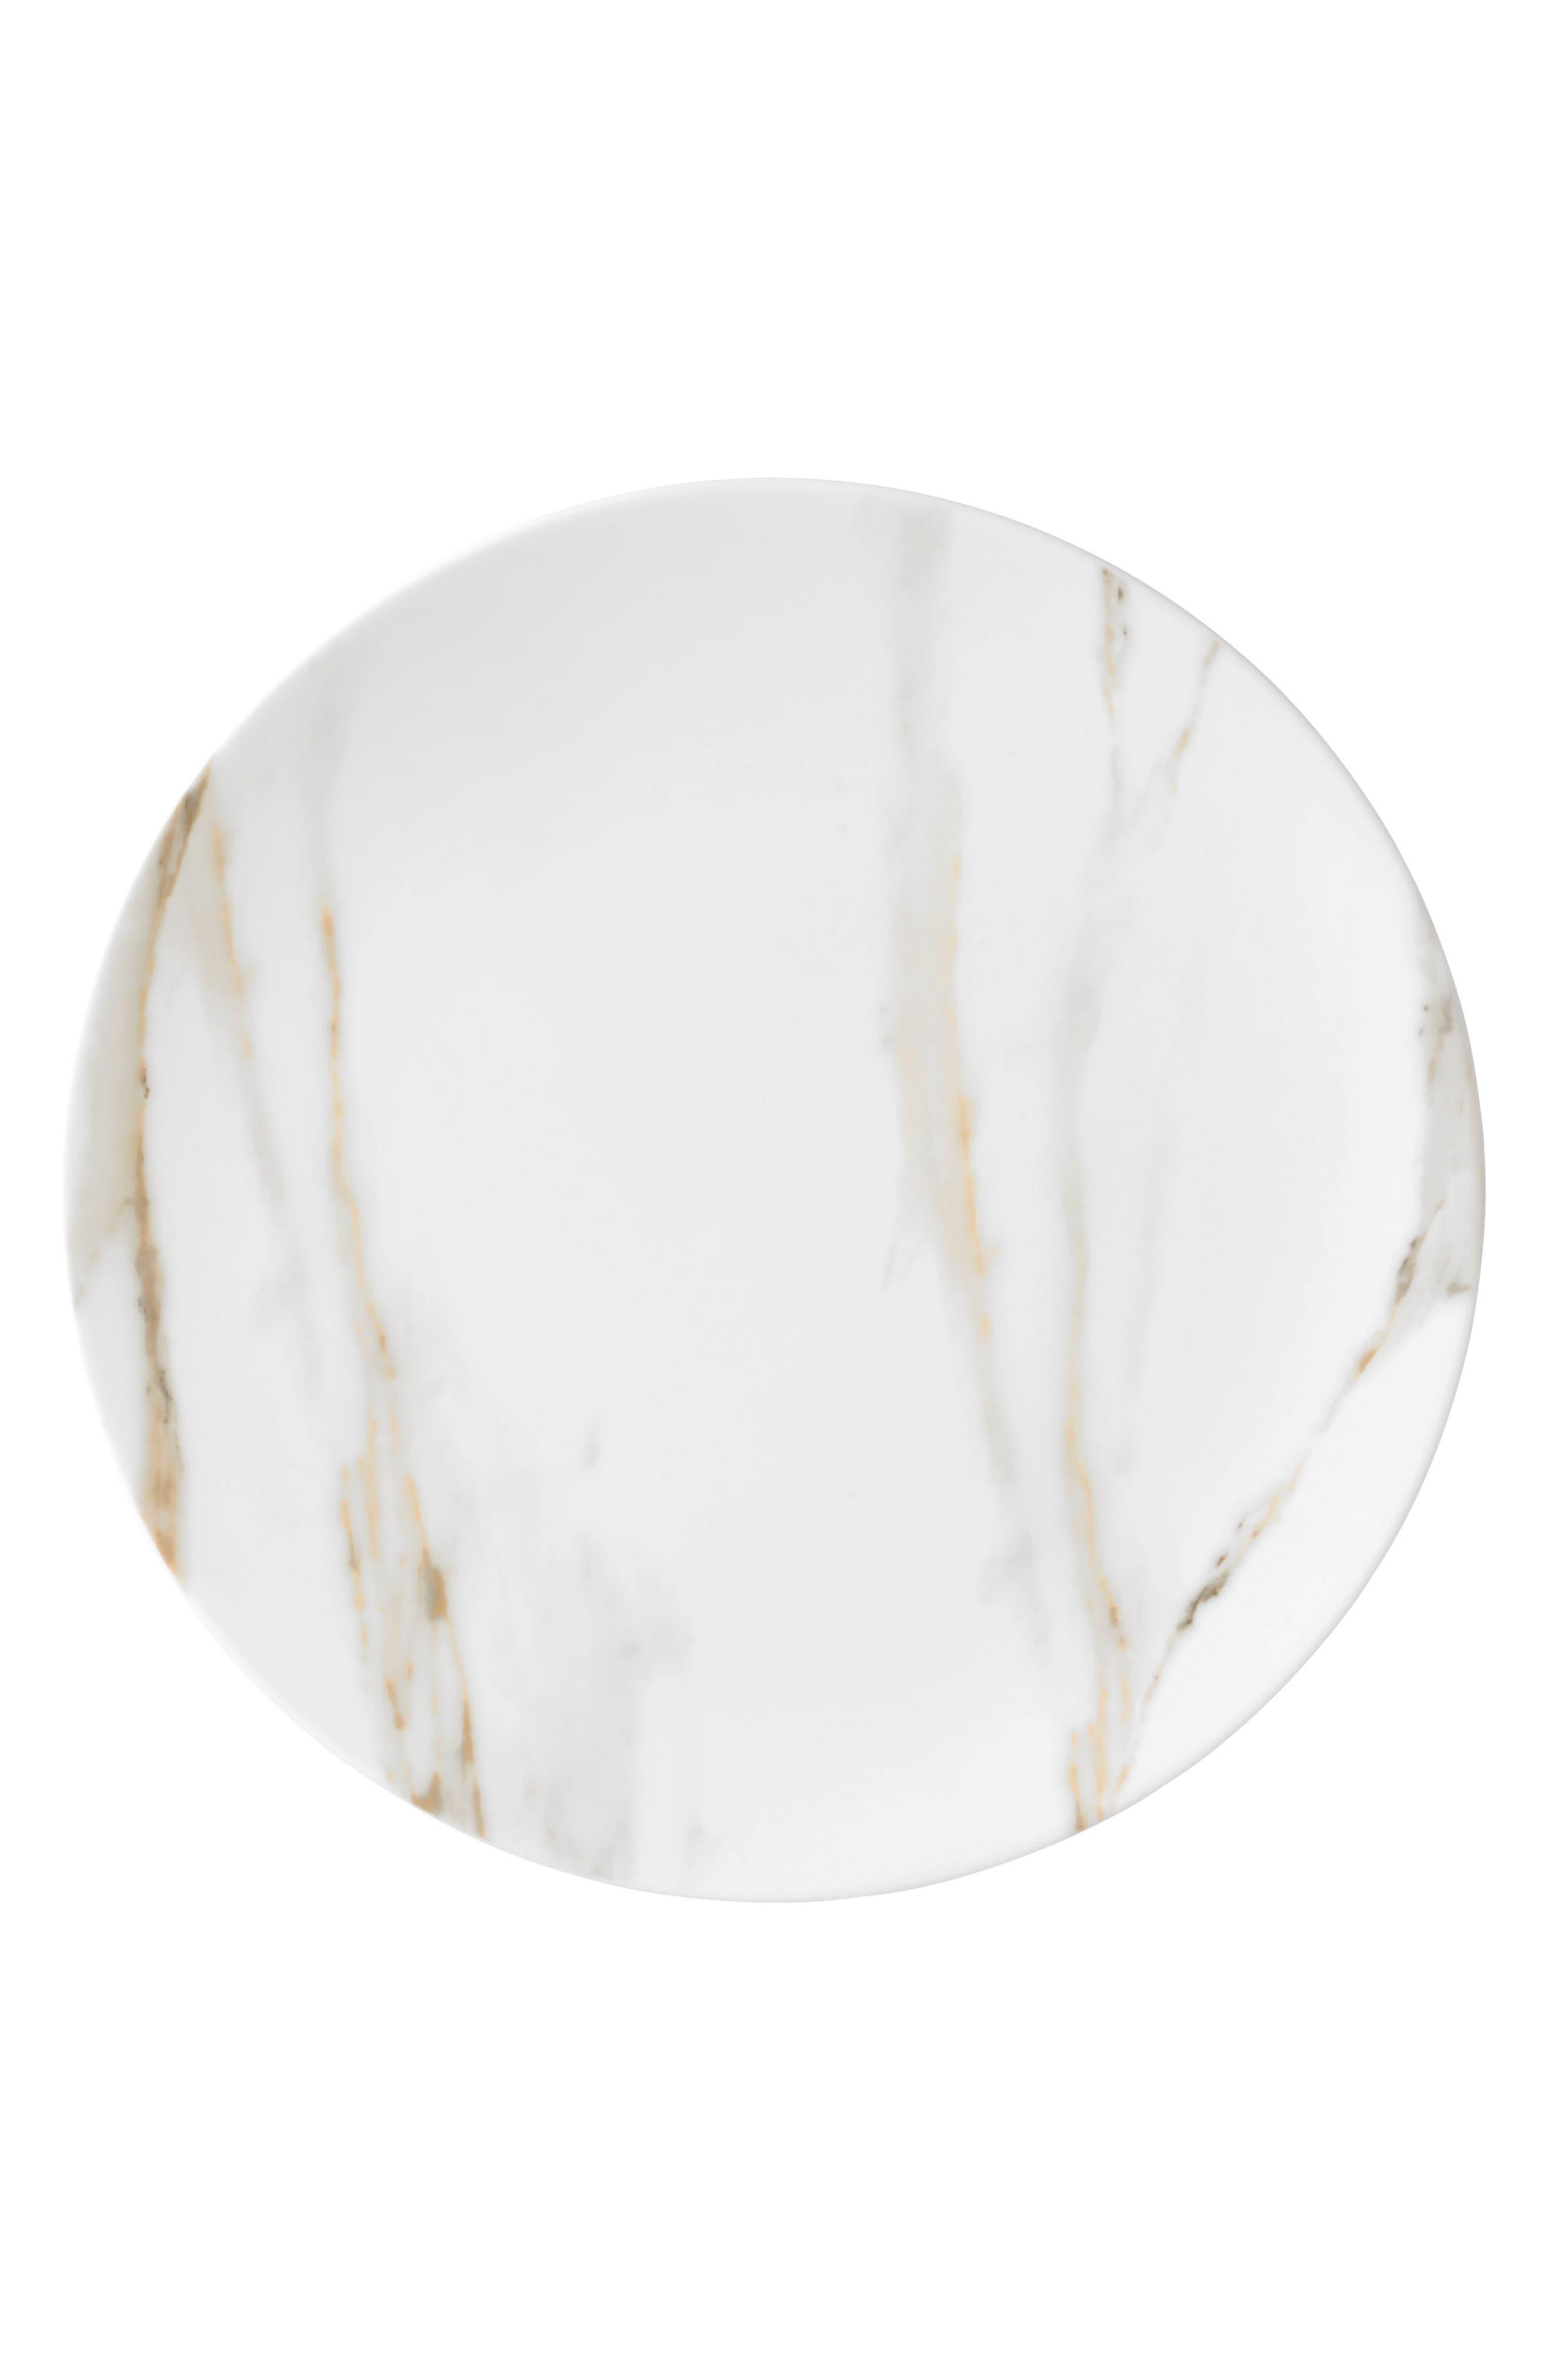 Main Image - Vera Wang x Wedgwood Venato Imperial Salad Plate